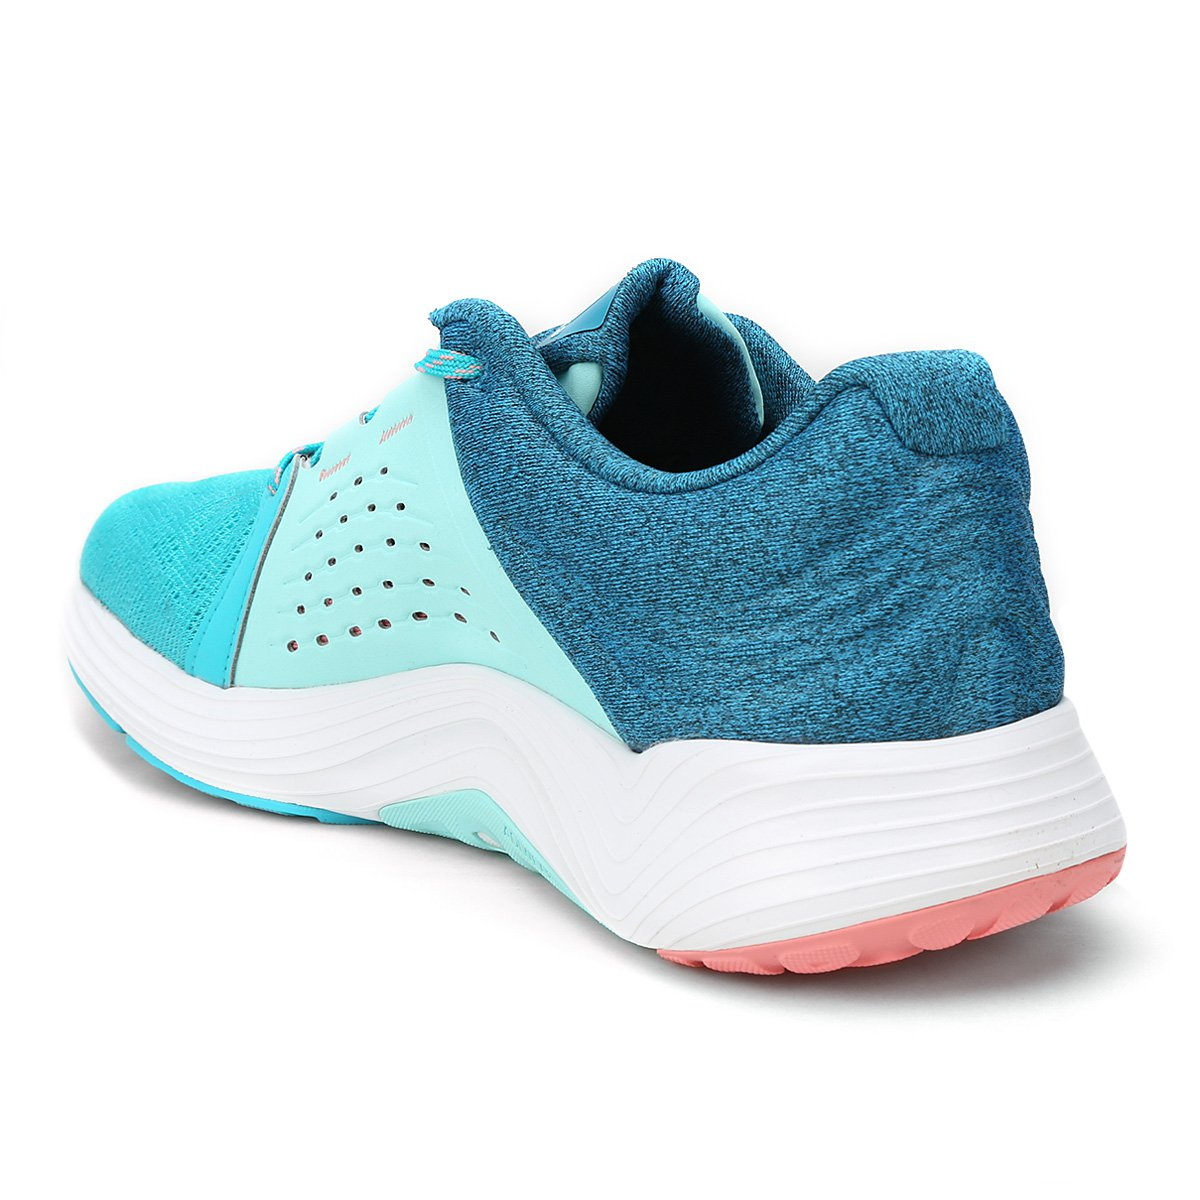 Tênis Adidas Fluid Cloud Feminino - Azul Piscina e Azul Claro ... 0b081aef7f4f1